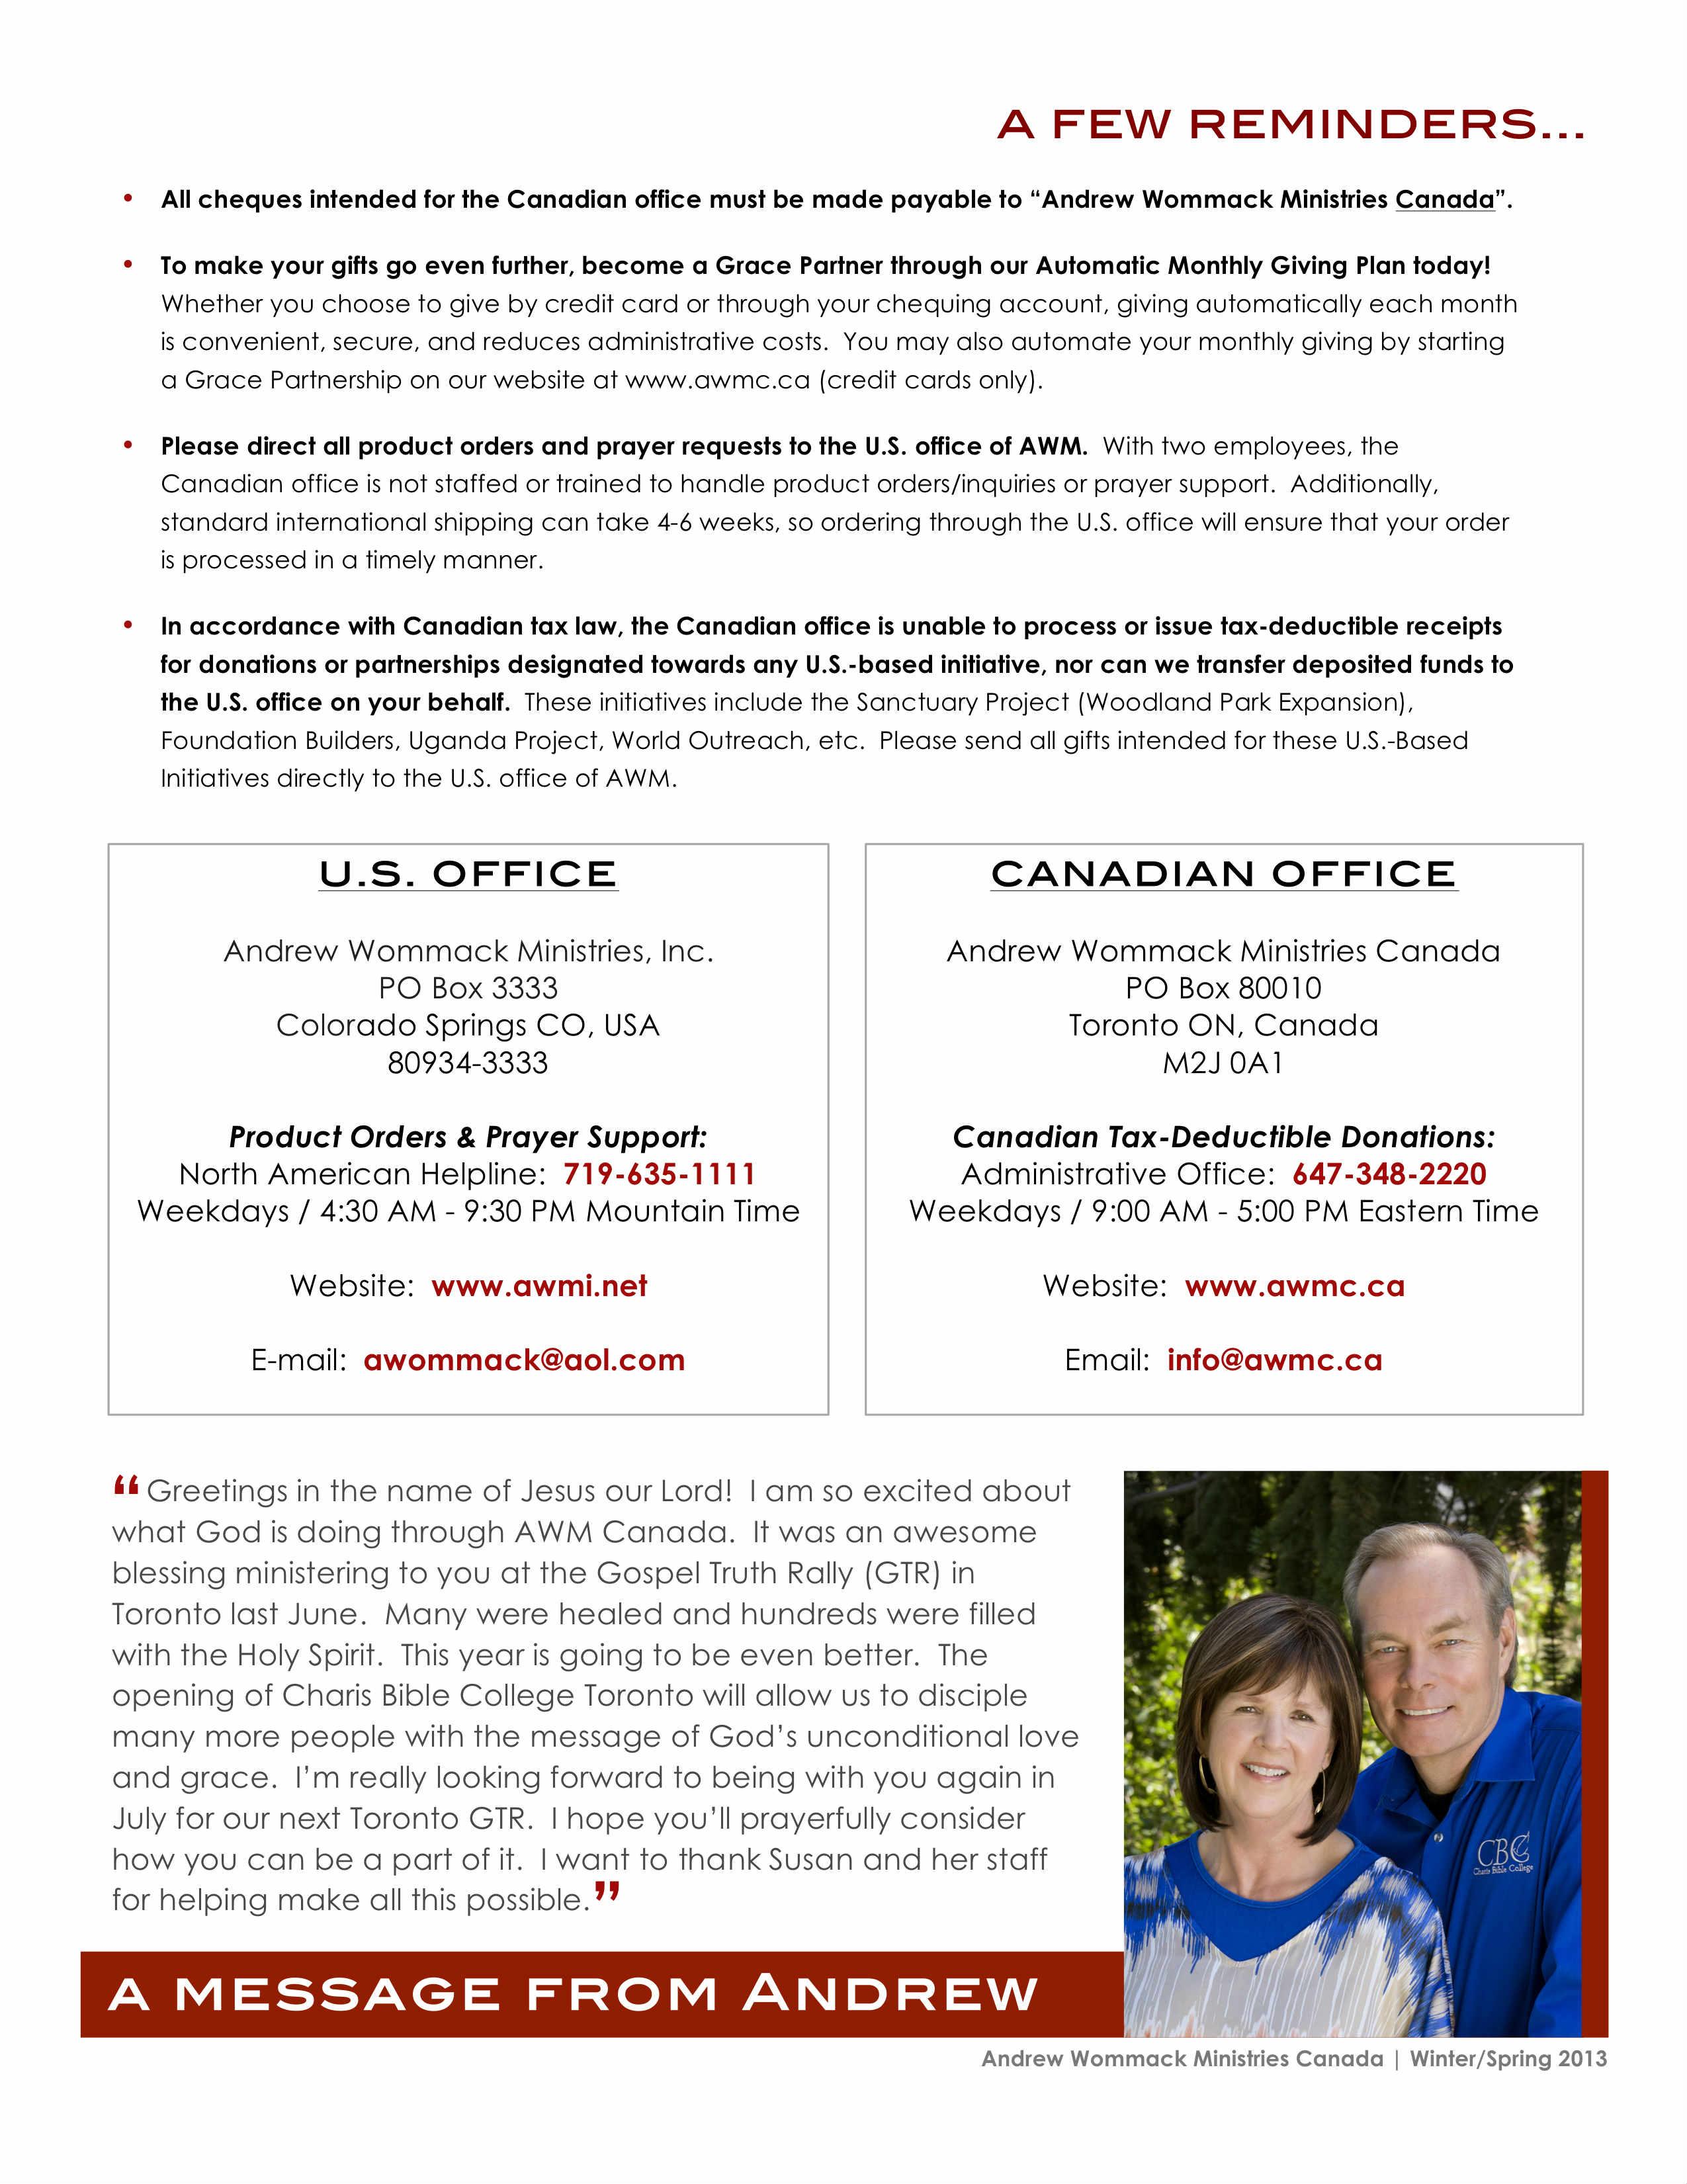 AWMC Winter/Spring 2013 Newsletter